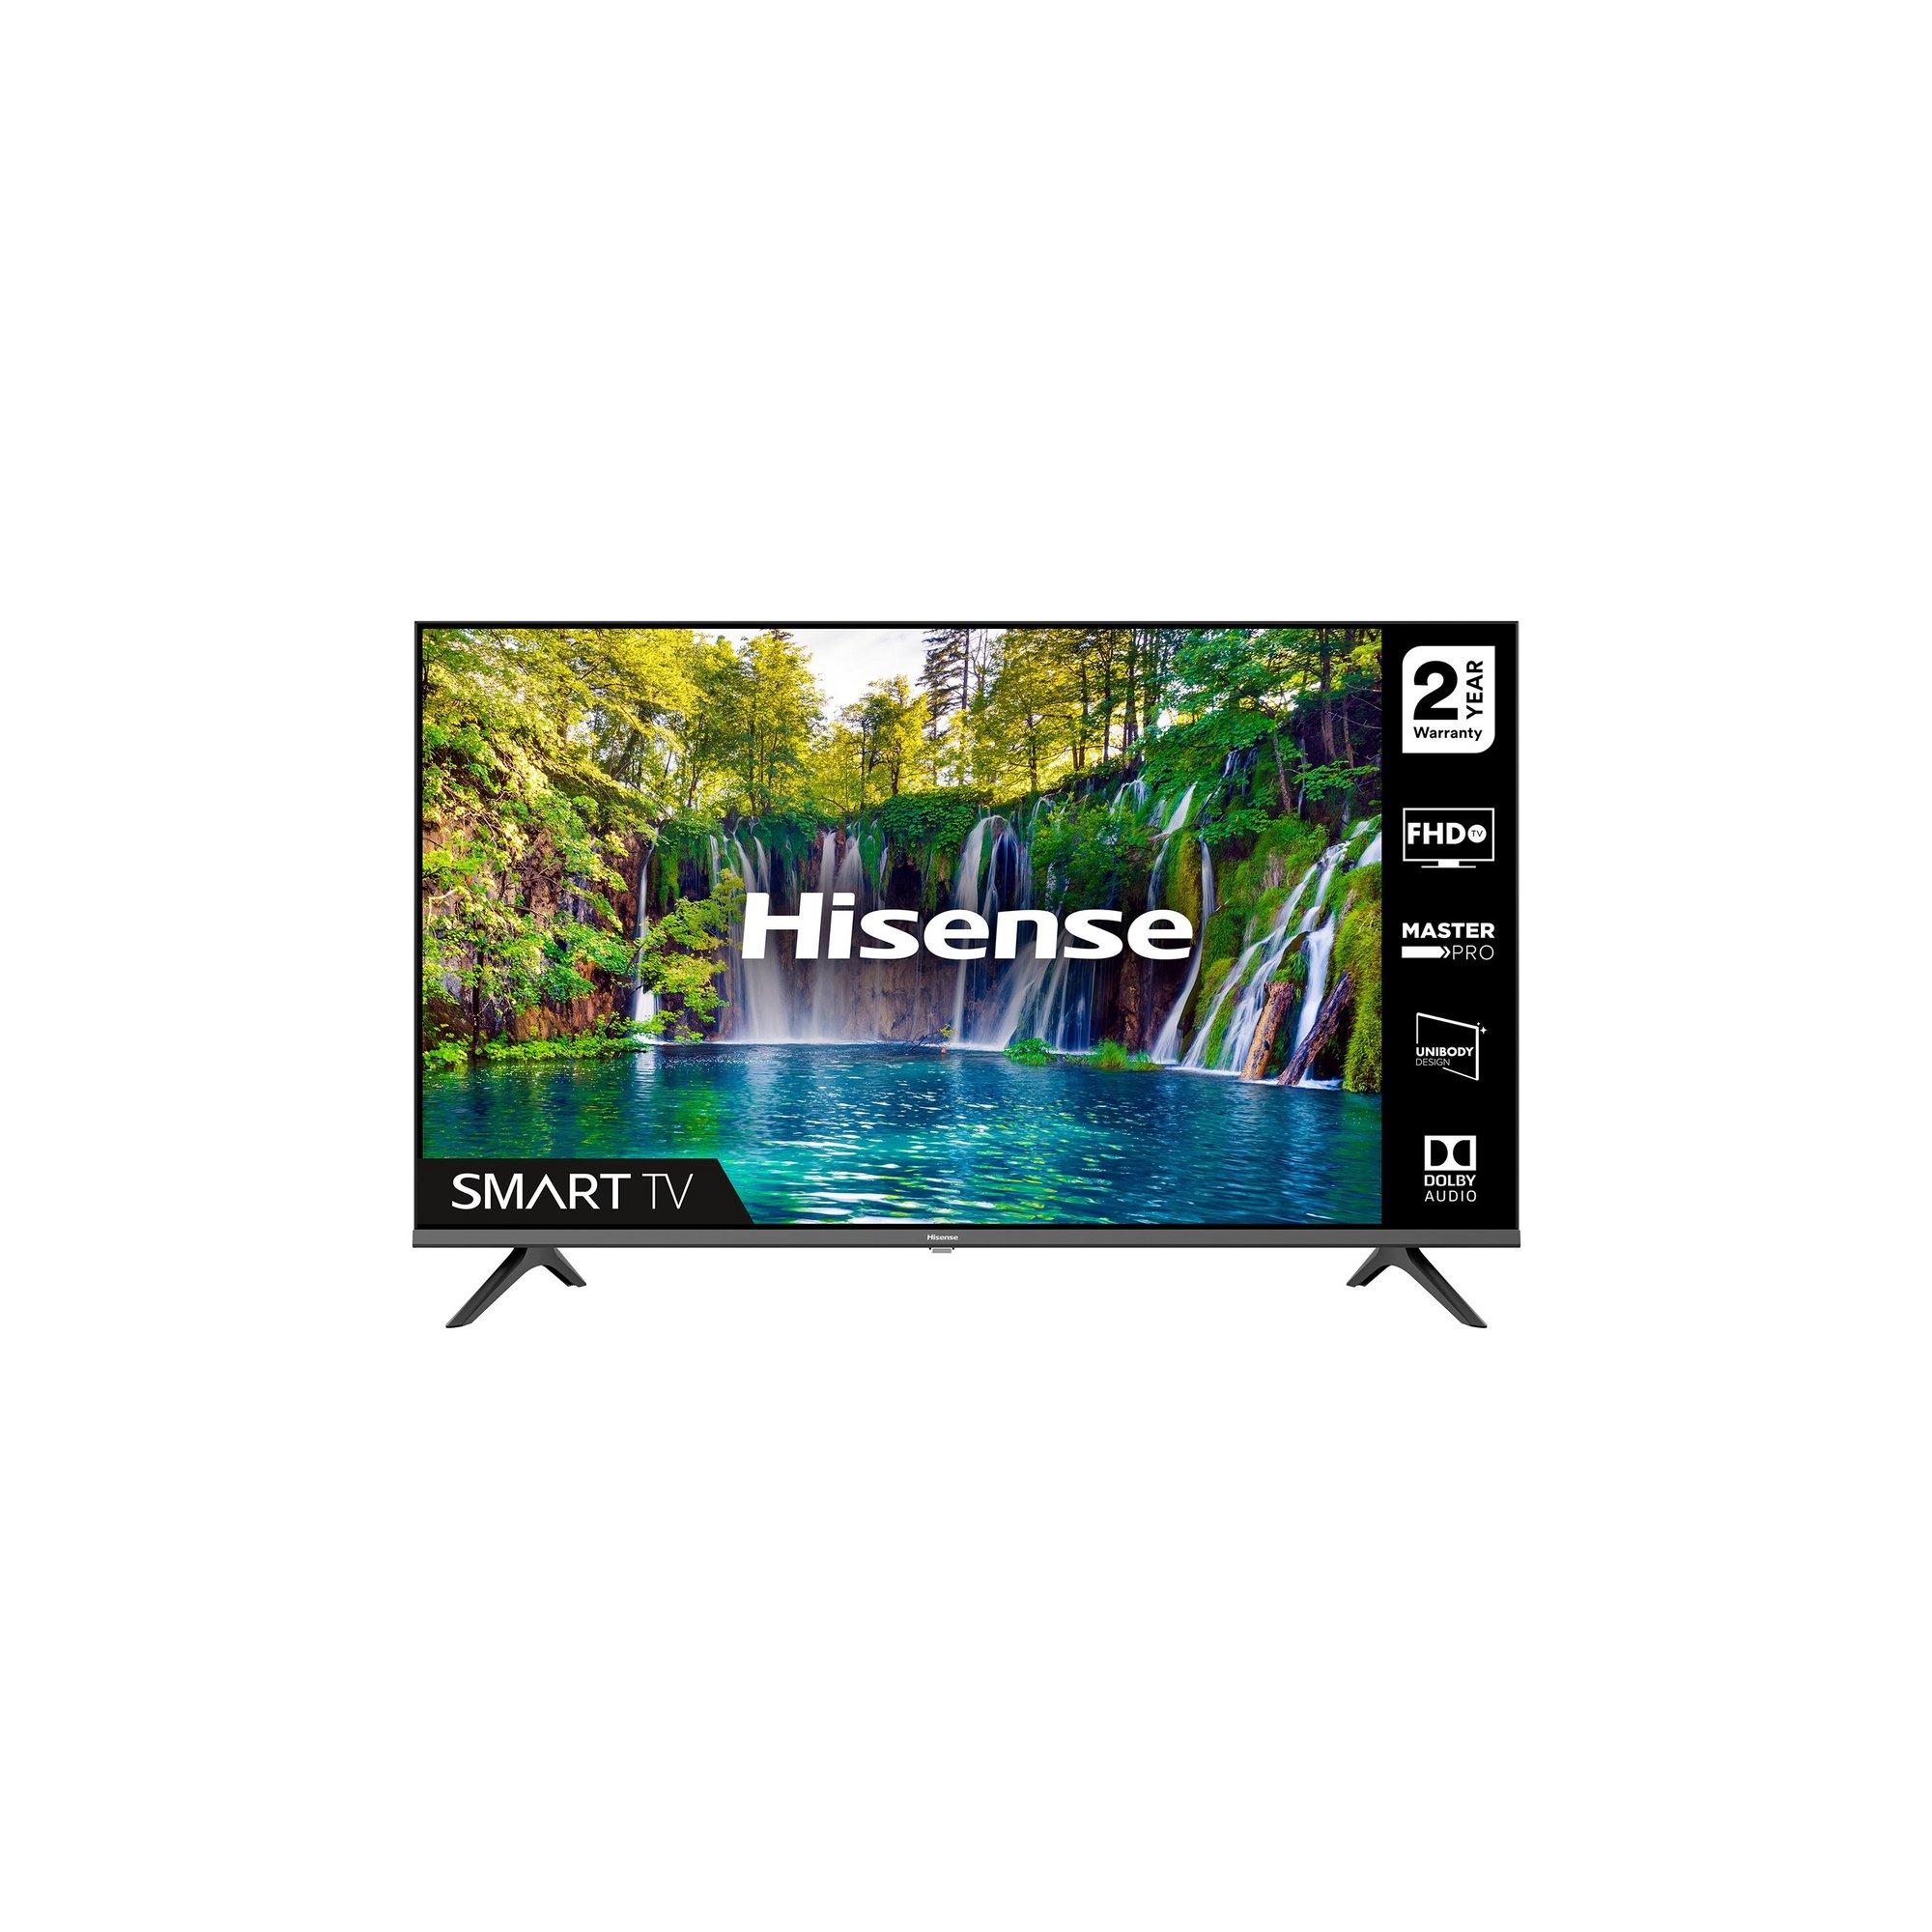 Image of Hisense 40 Inch A5600 Full HD Smart TV